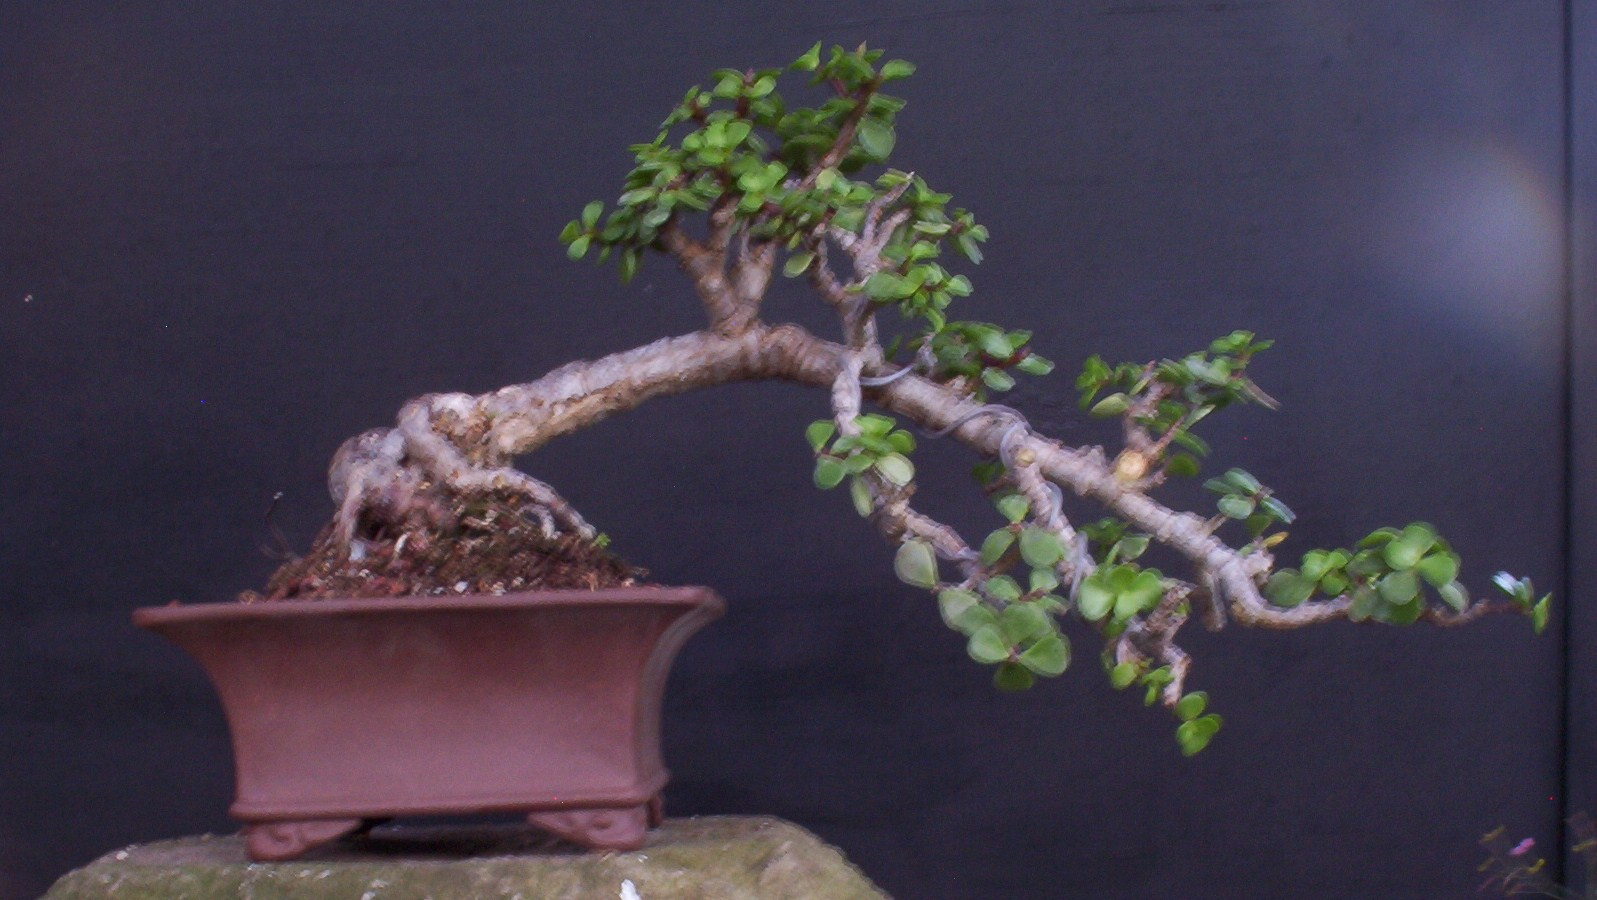 Bonsai Beginnings Portulacaria Afra Dwarf Jade